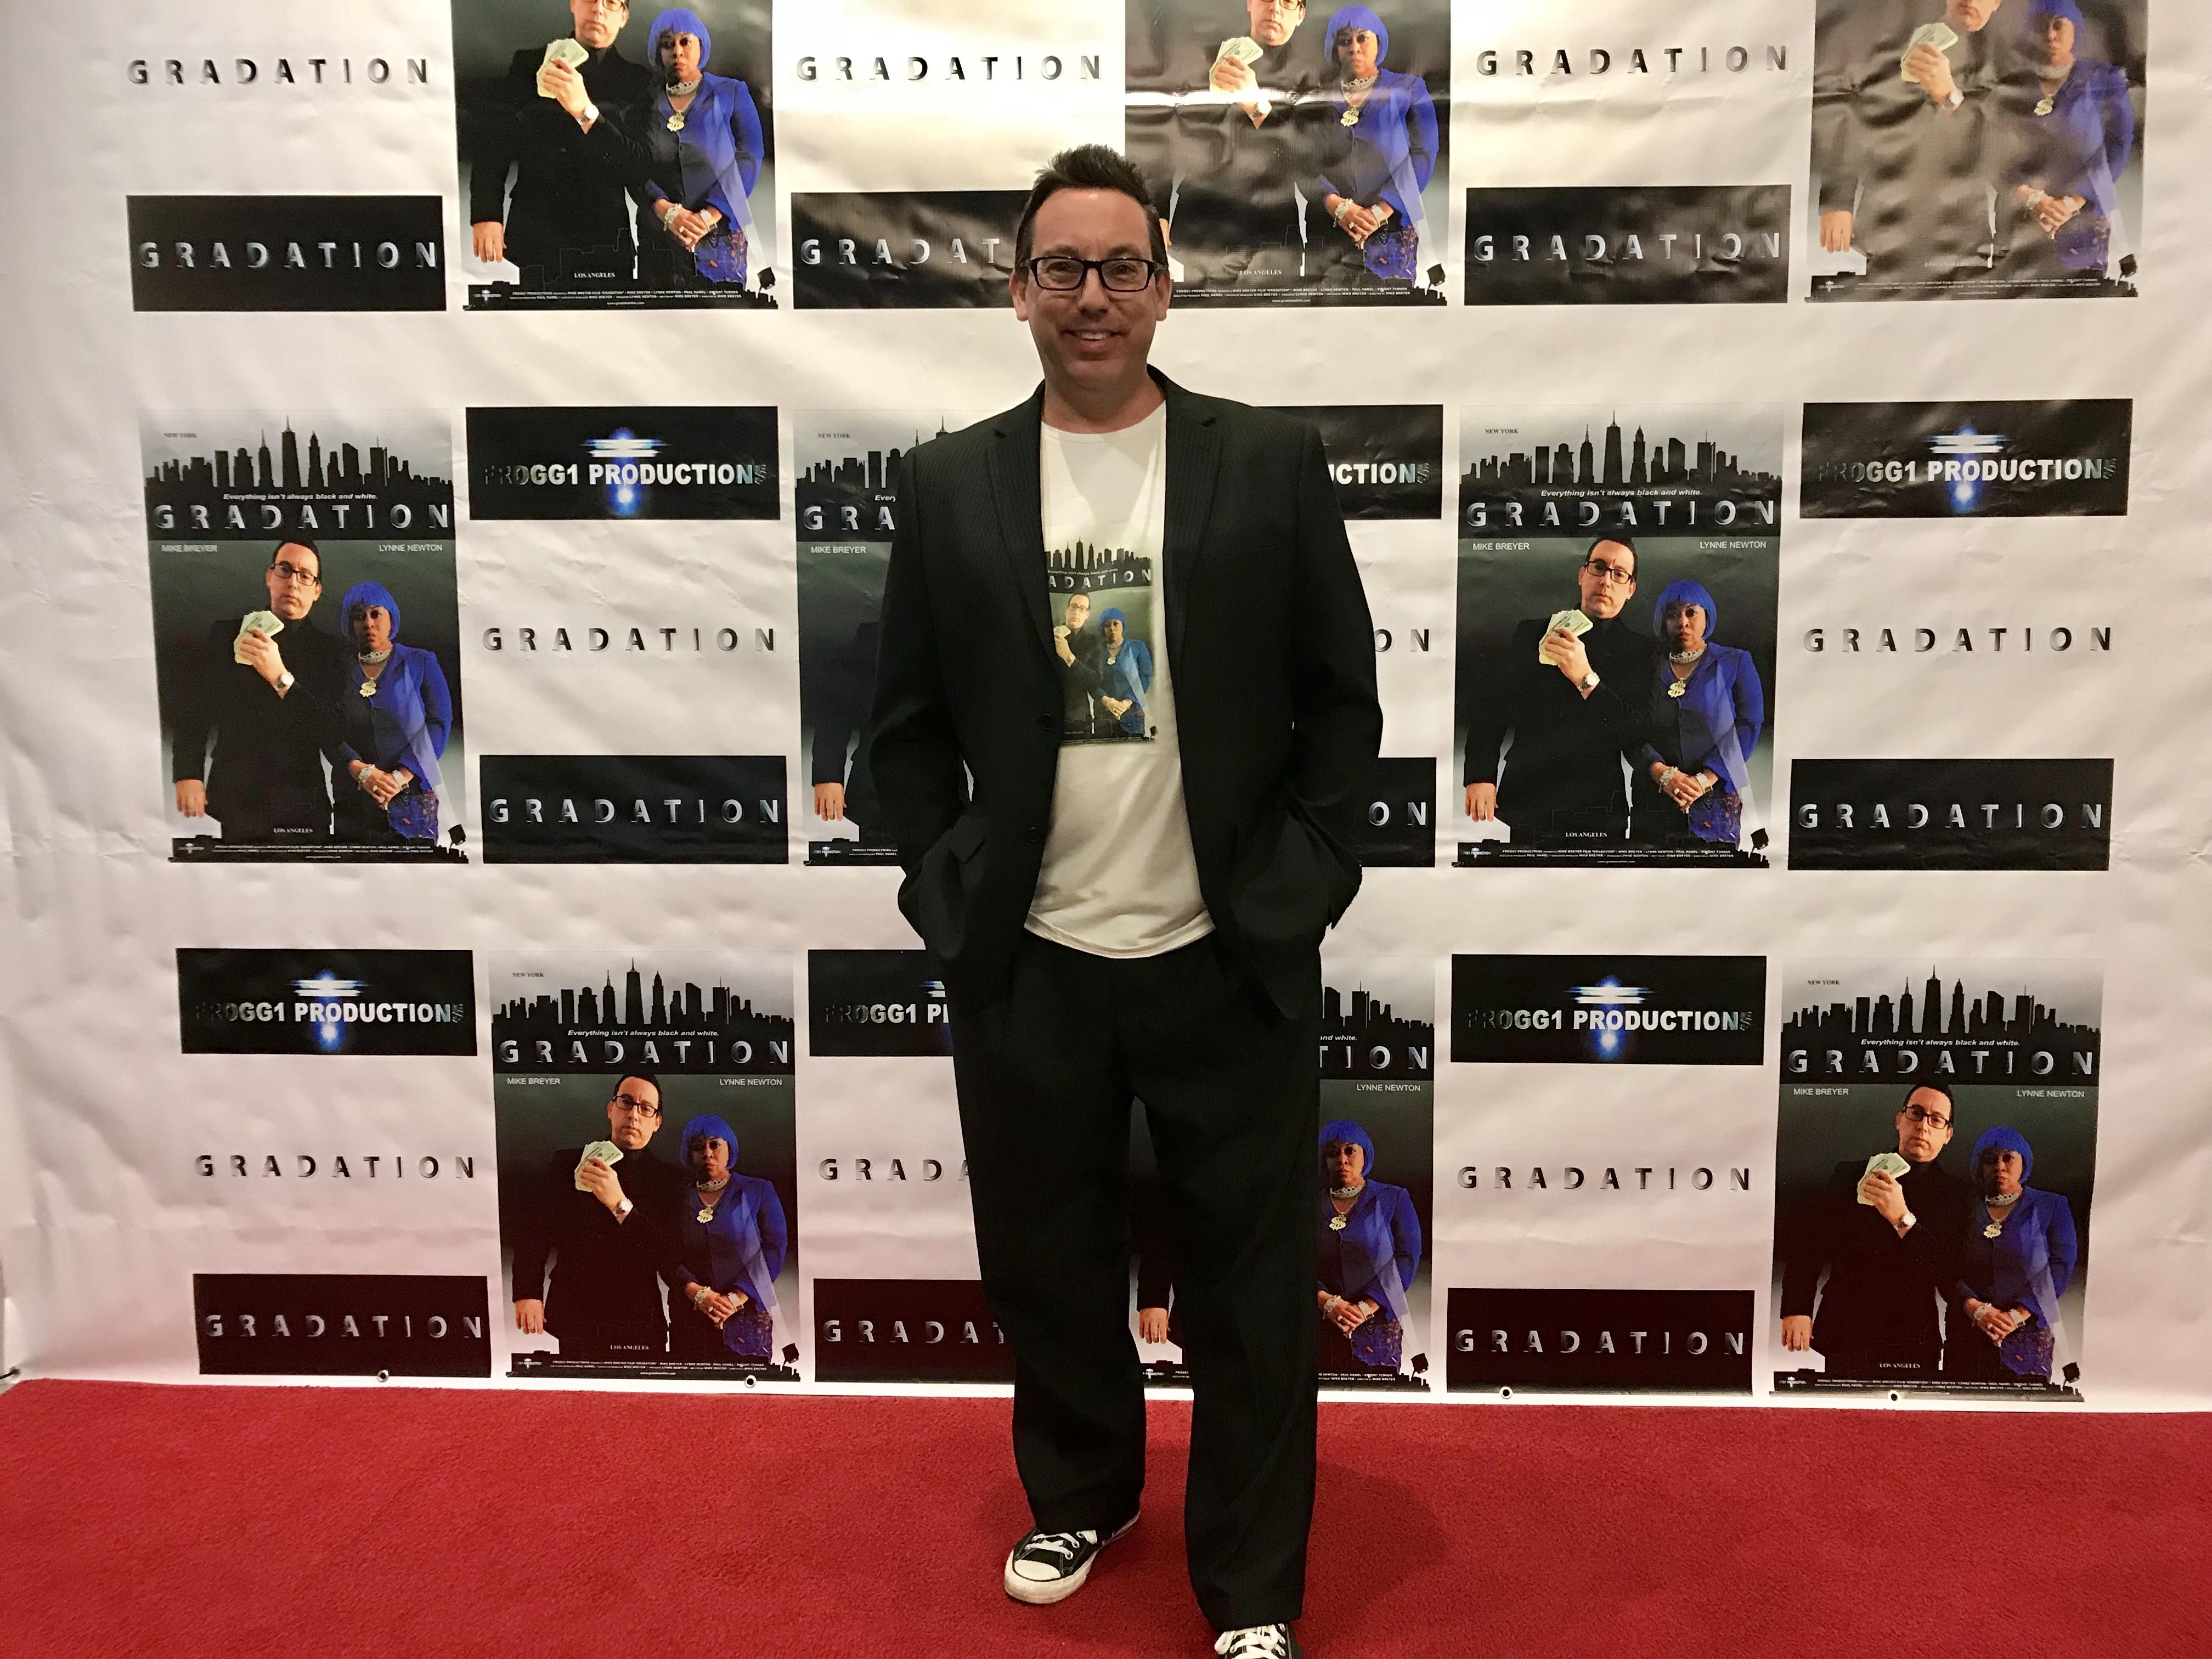 Gradation Red Carpet Premiere LAFS June 1 2018